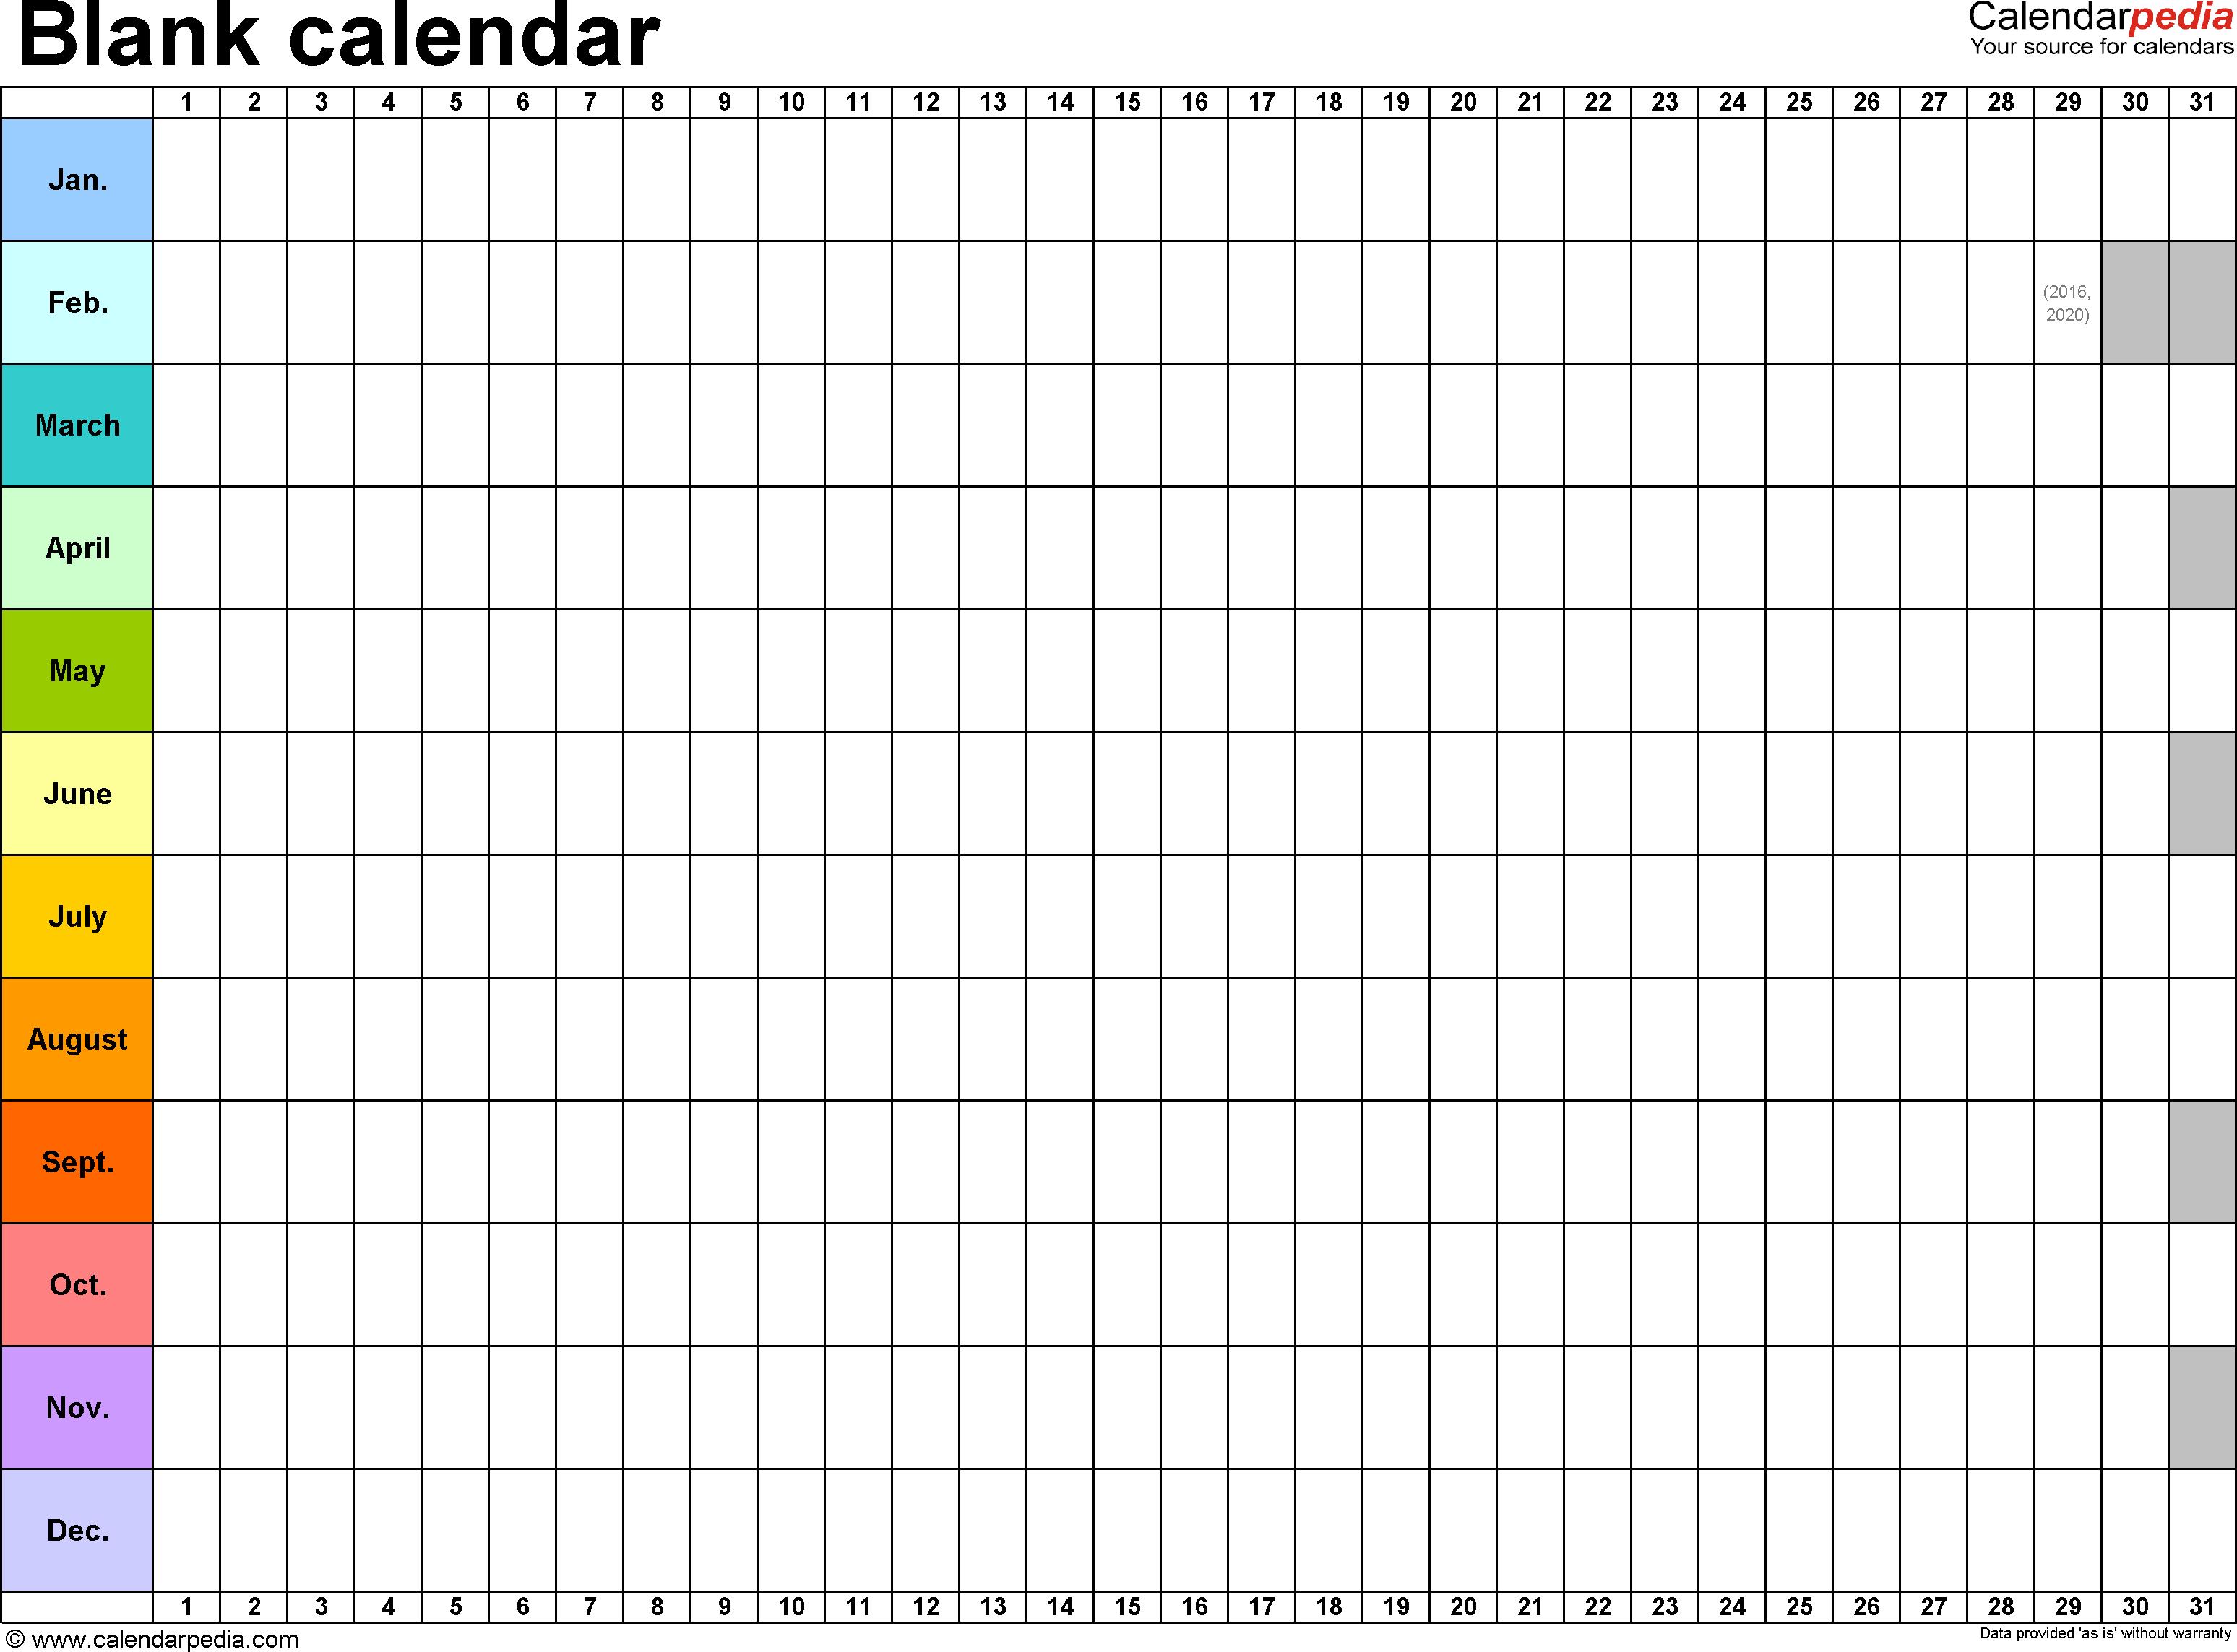 Month Calendar Template Word  Bolan.horizonconsulting.co for Blank Calendar Template Word